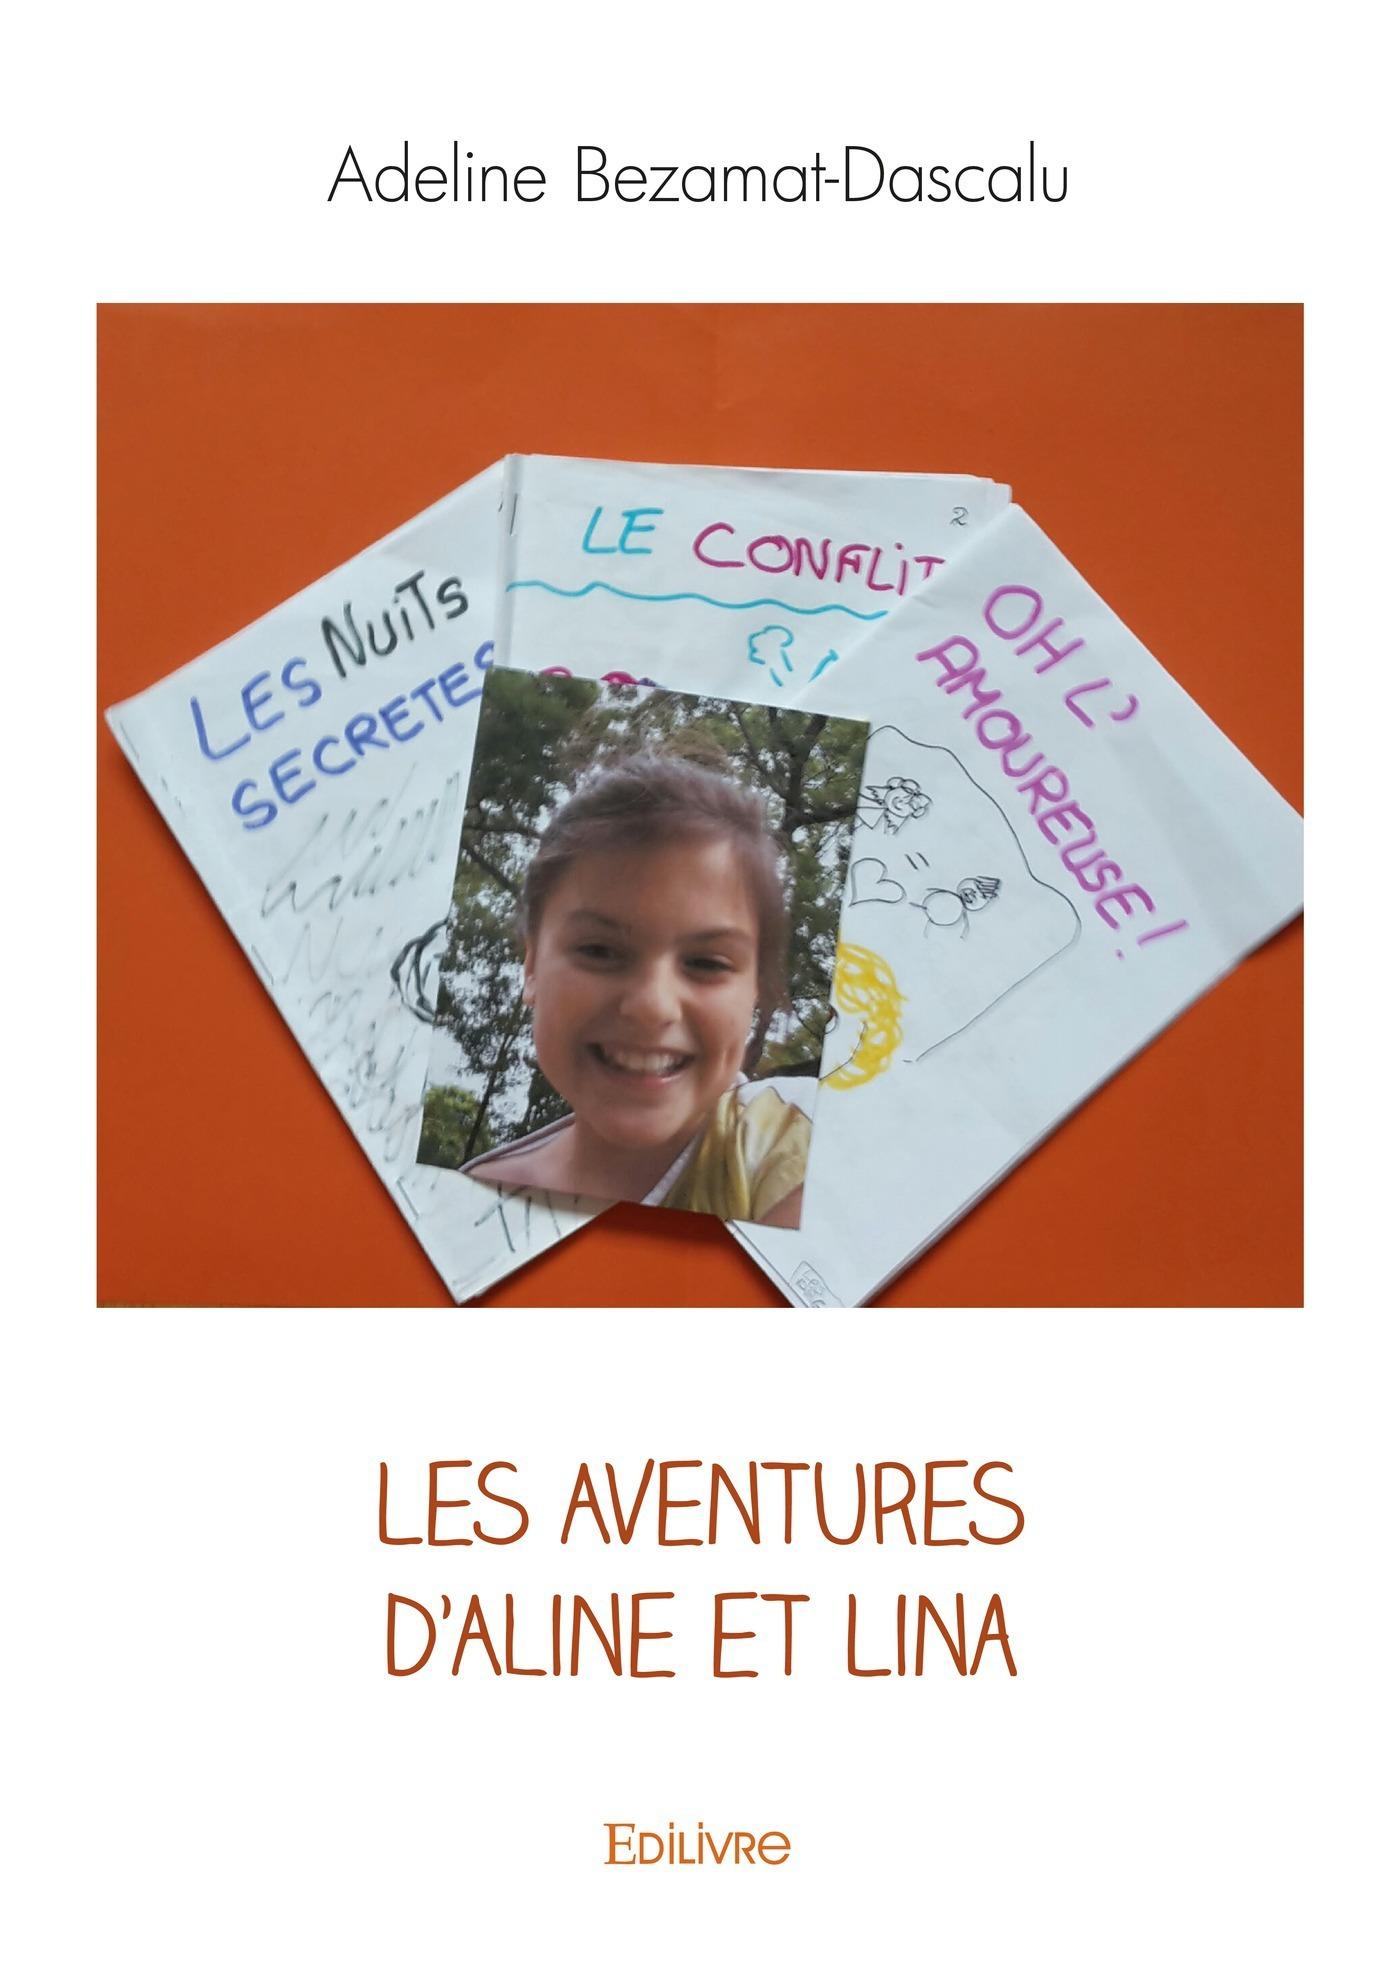 Les Aventures d'Aline et Lina  - Adeline Bezamat-Dascalu